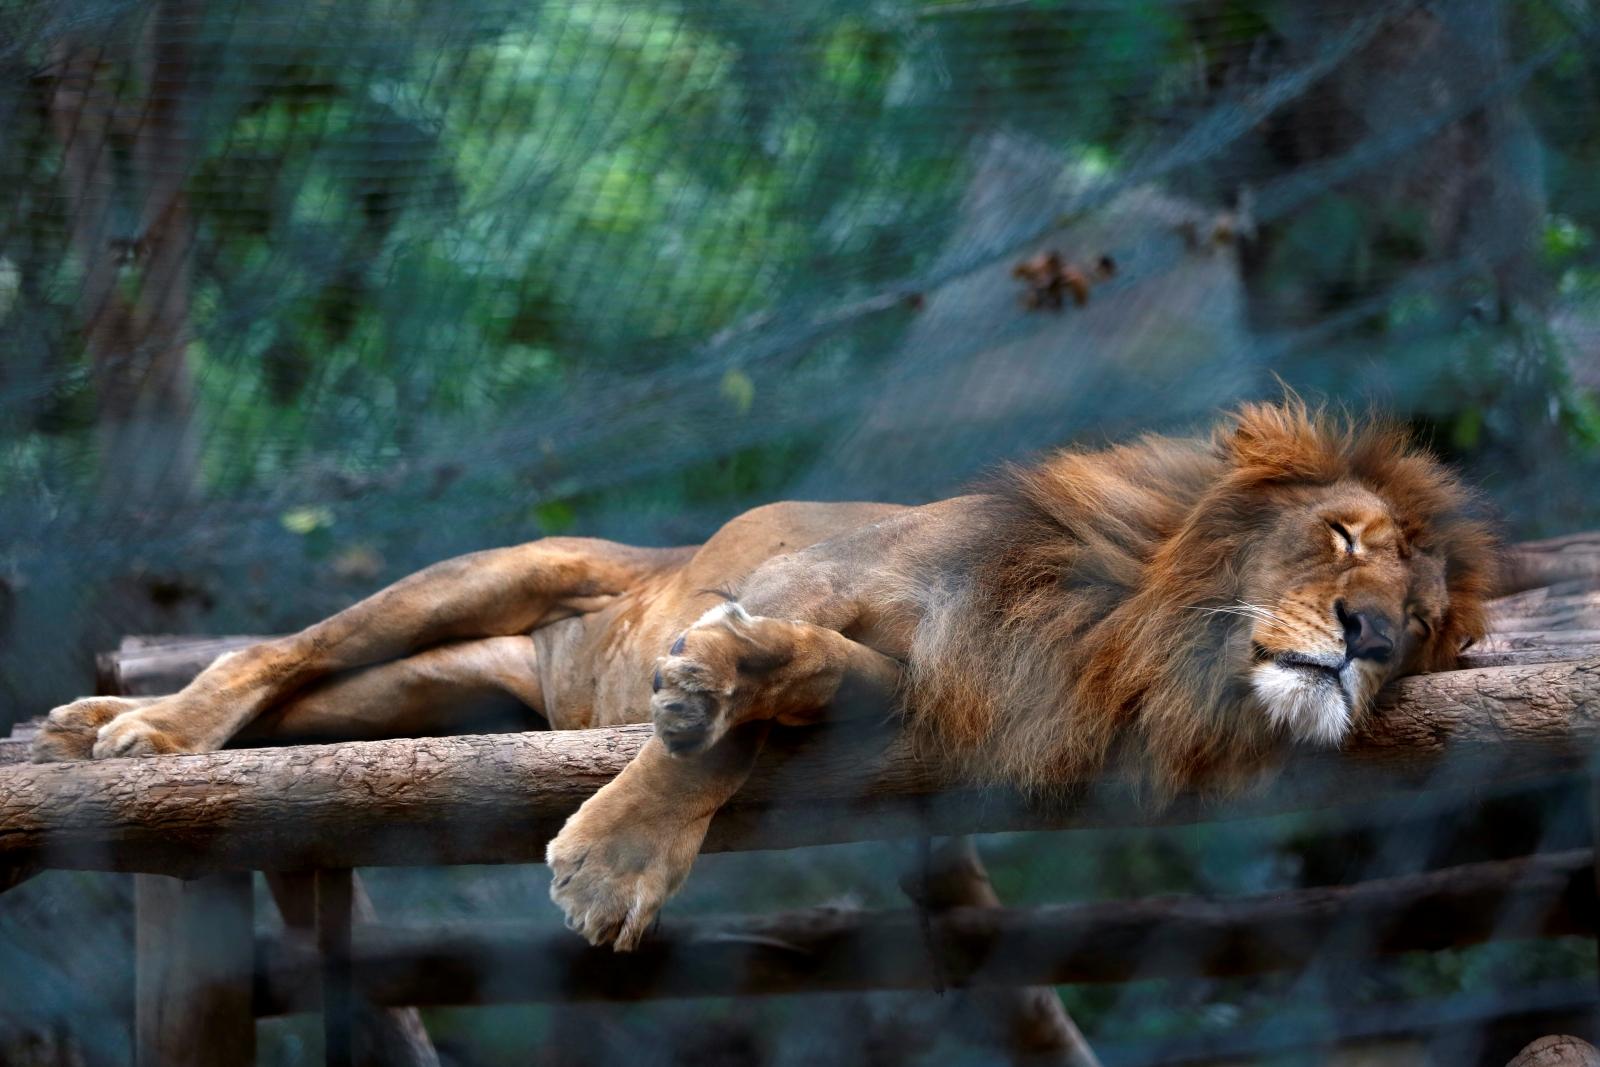 animals venezuela food zoo die zoos died eat several crisis killing sad them because